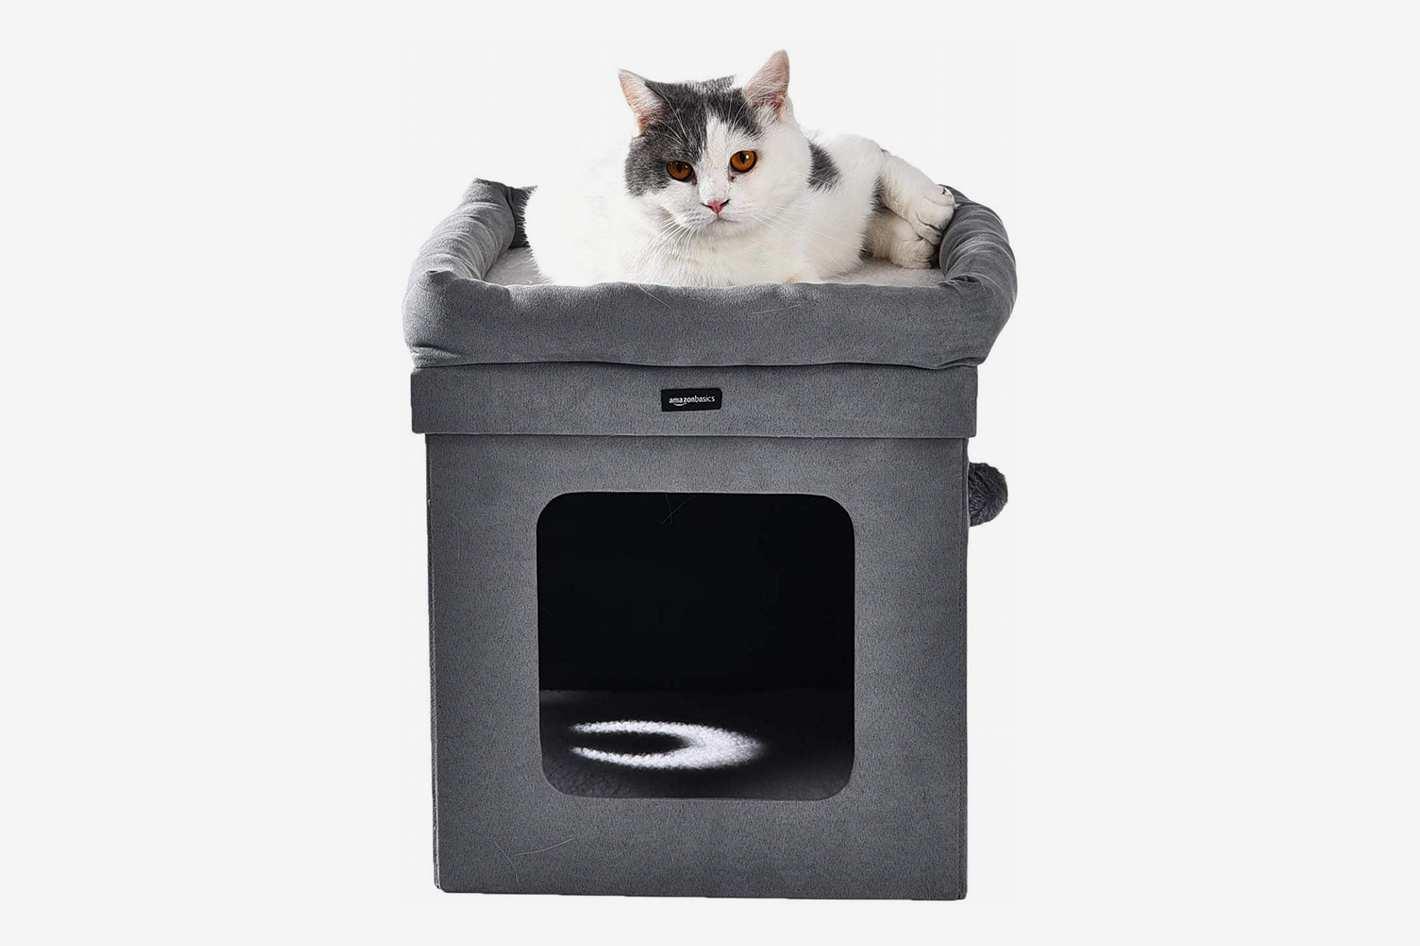 AmazonBasics Collapsible Cat House